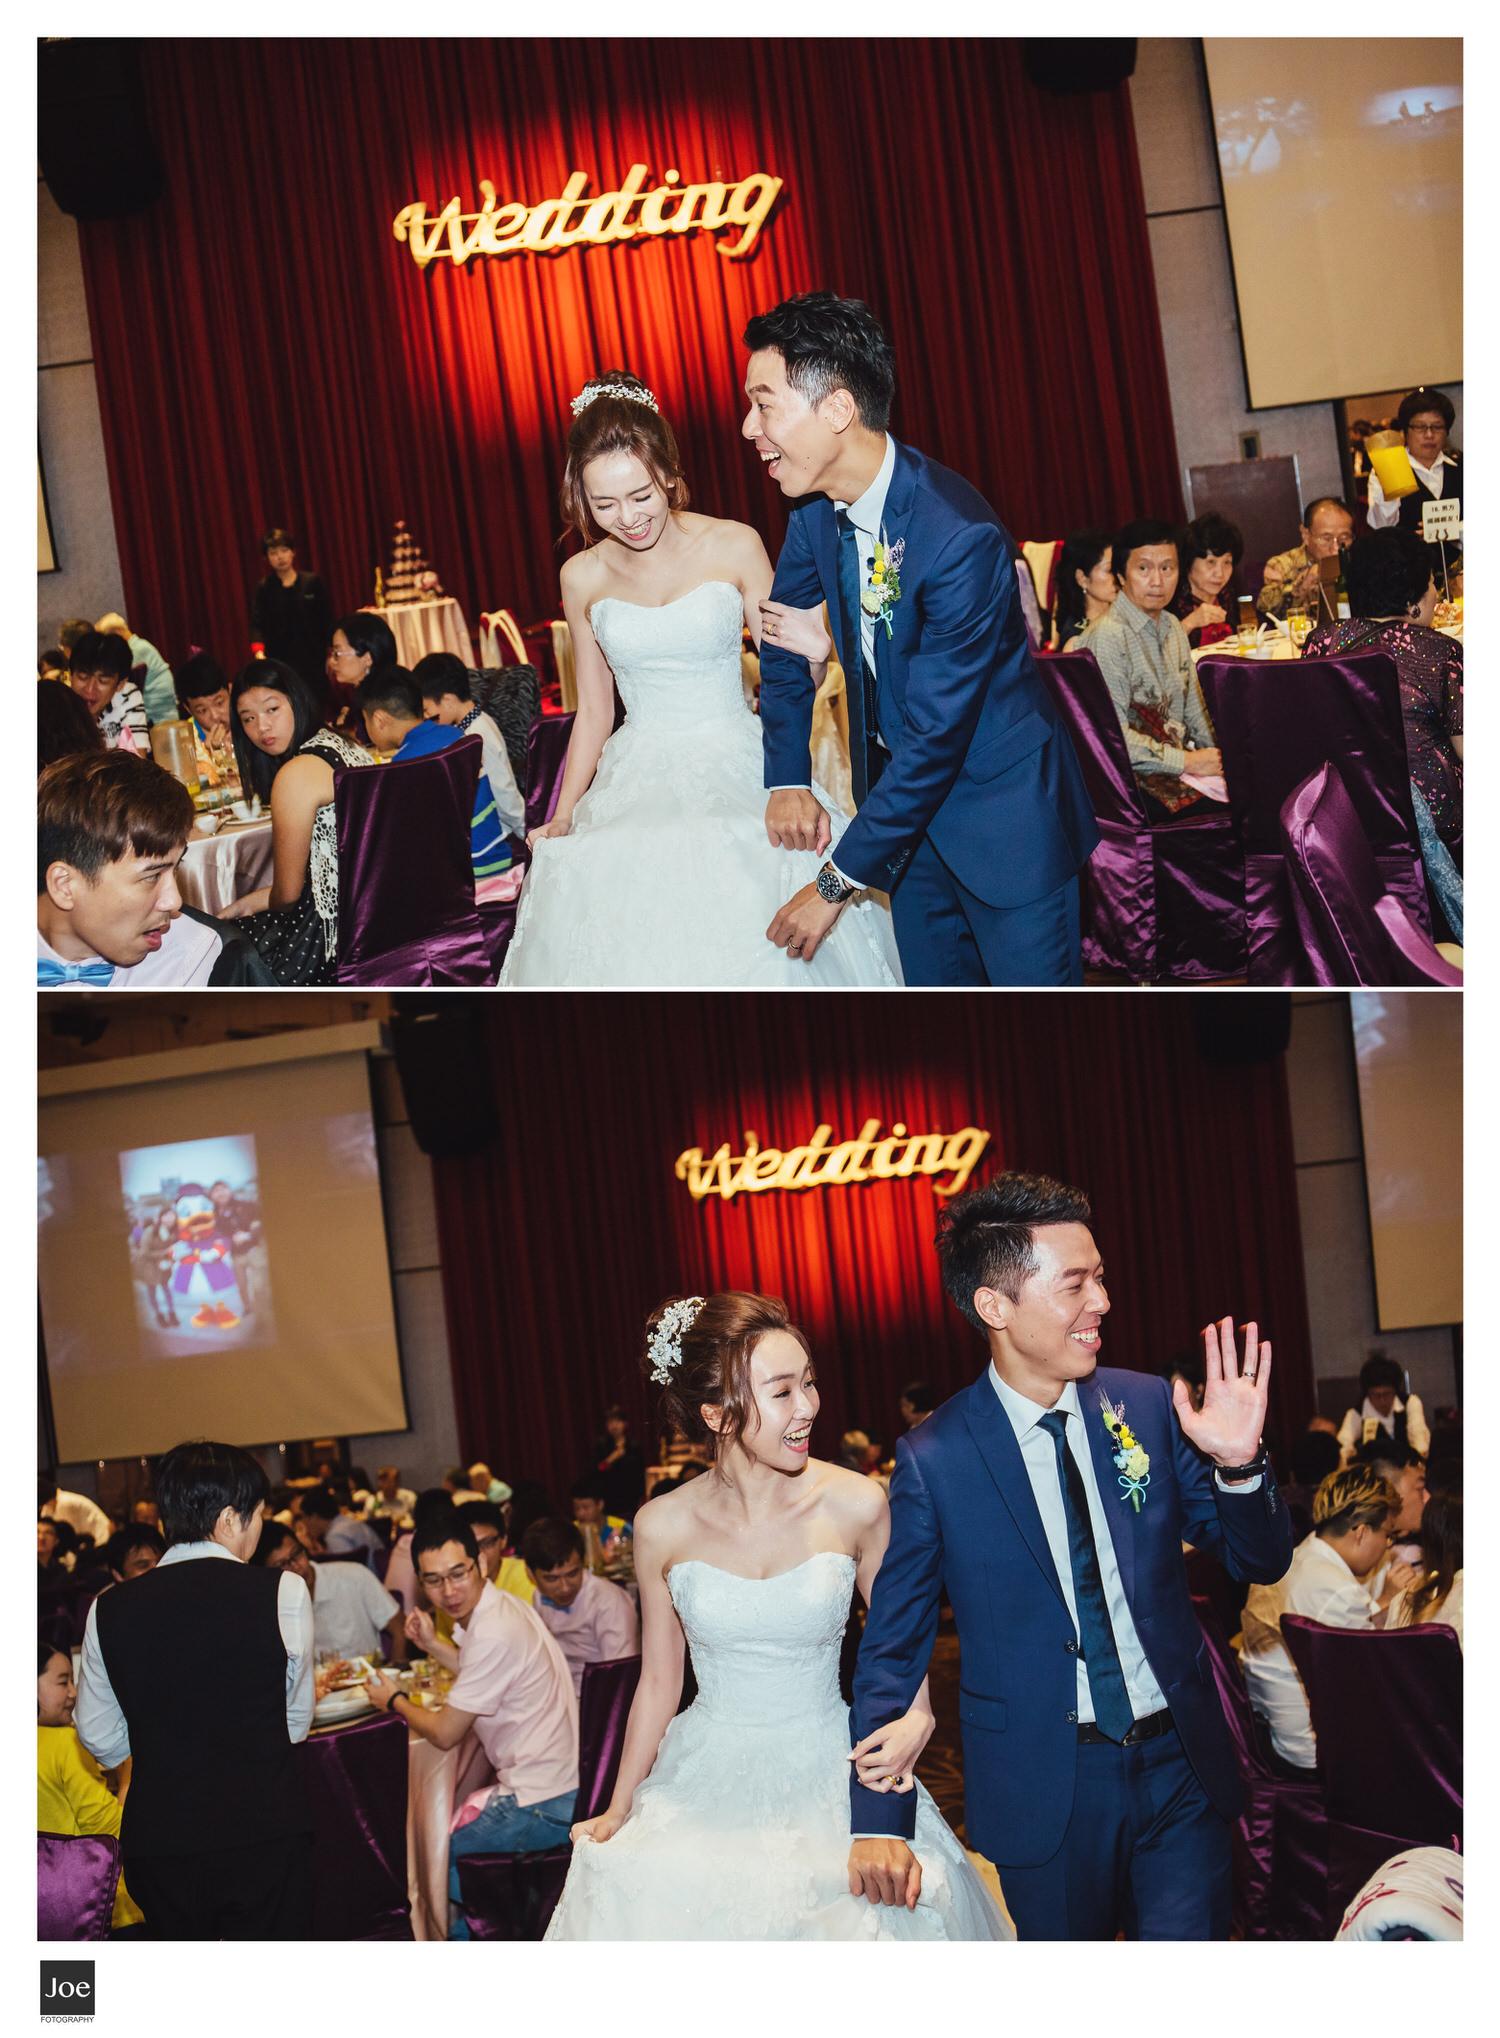 jc-olivia-wedding-100-liyan-banquet-hall-joe-fotography.jpg